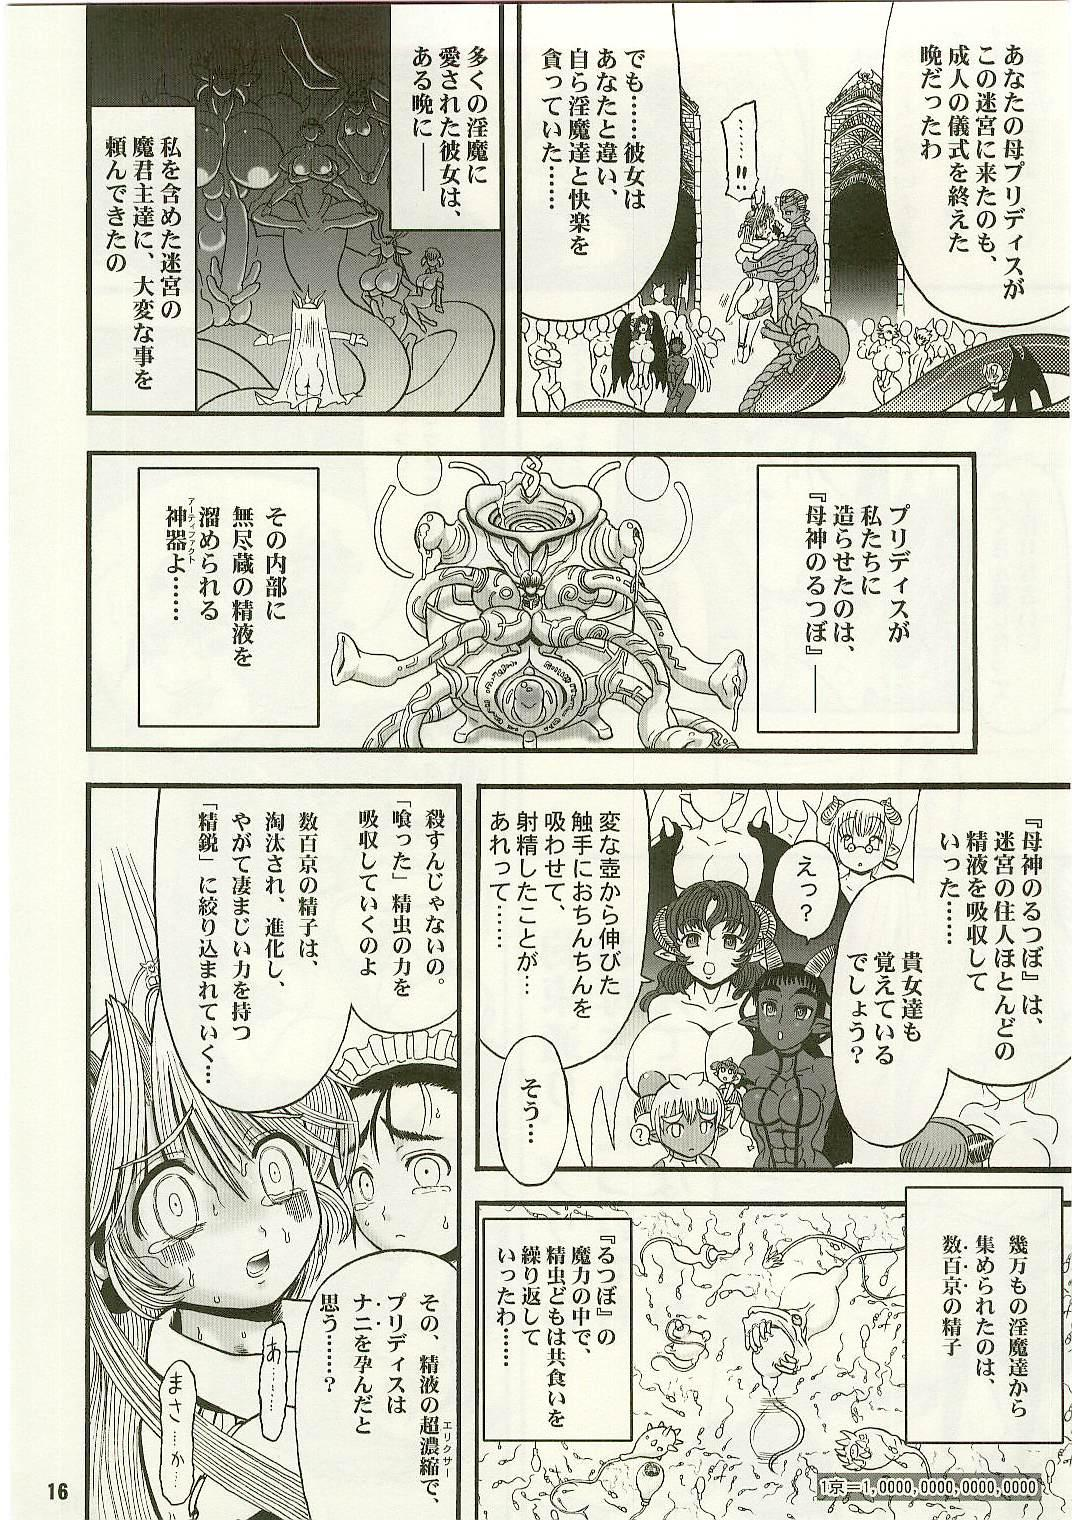 TGWOA Vol.17 - Meikyuu Oujo Prina 3 13